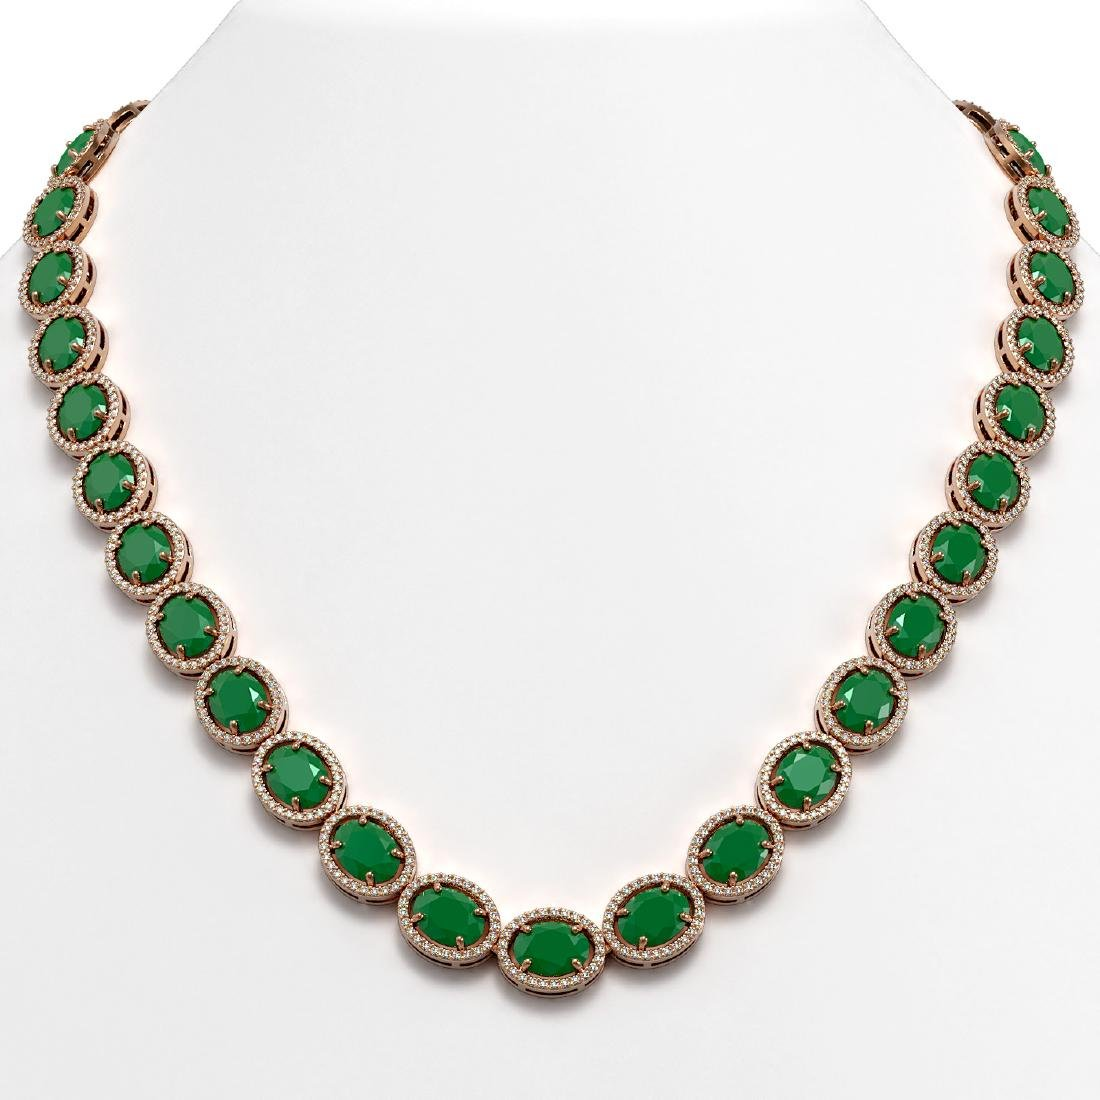 71.87 CTW Emerald & Diamond Halo Necklace 10K Rose Gold